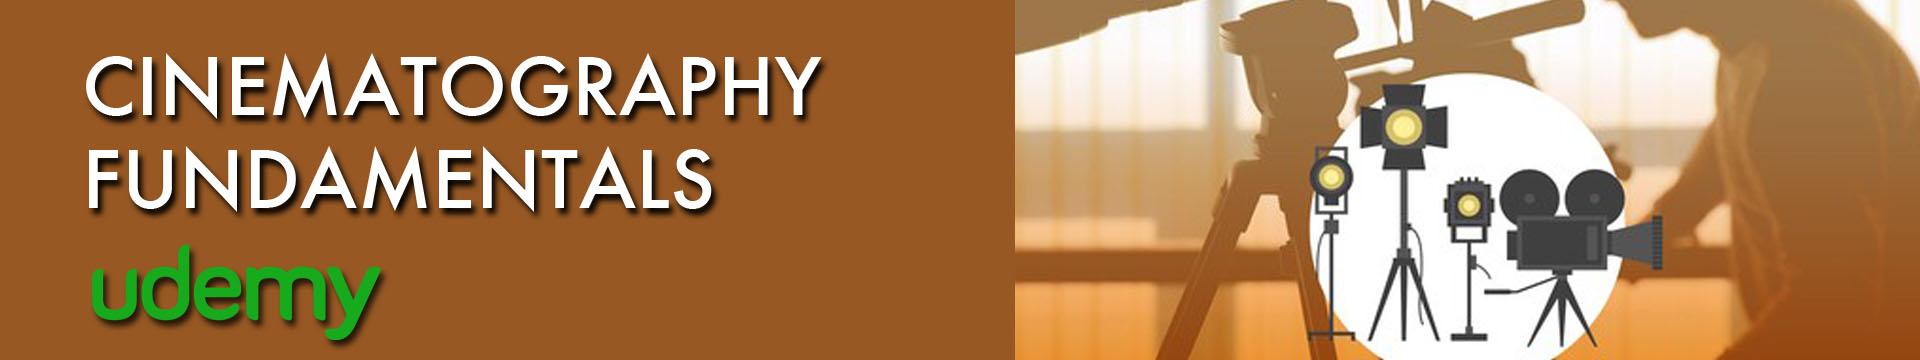 Udemy Cinematography 02 Banner